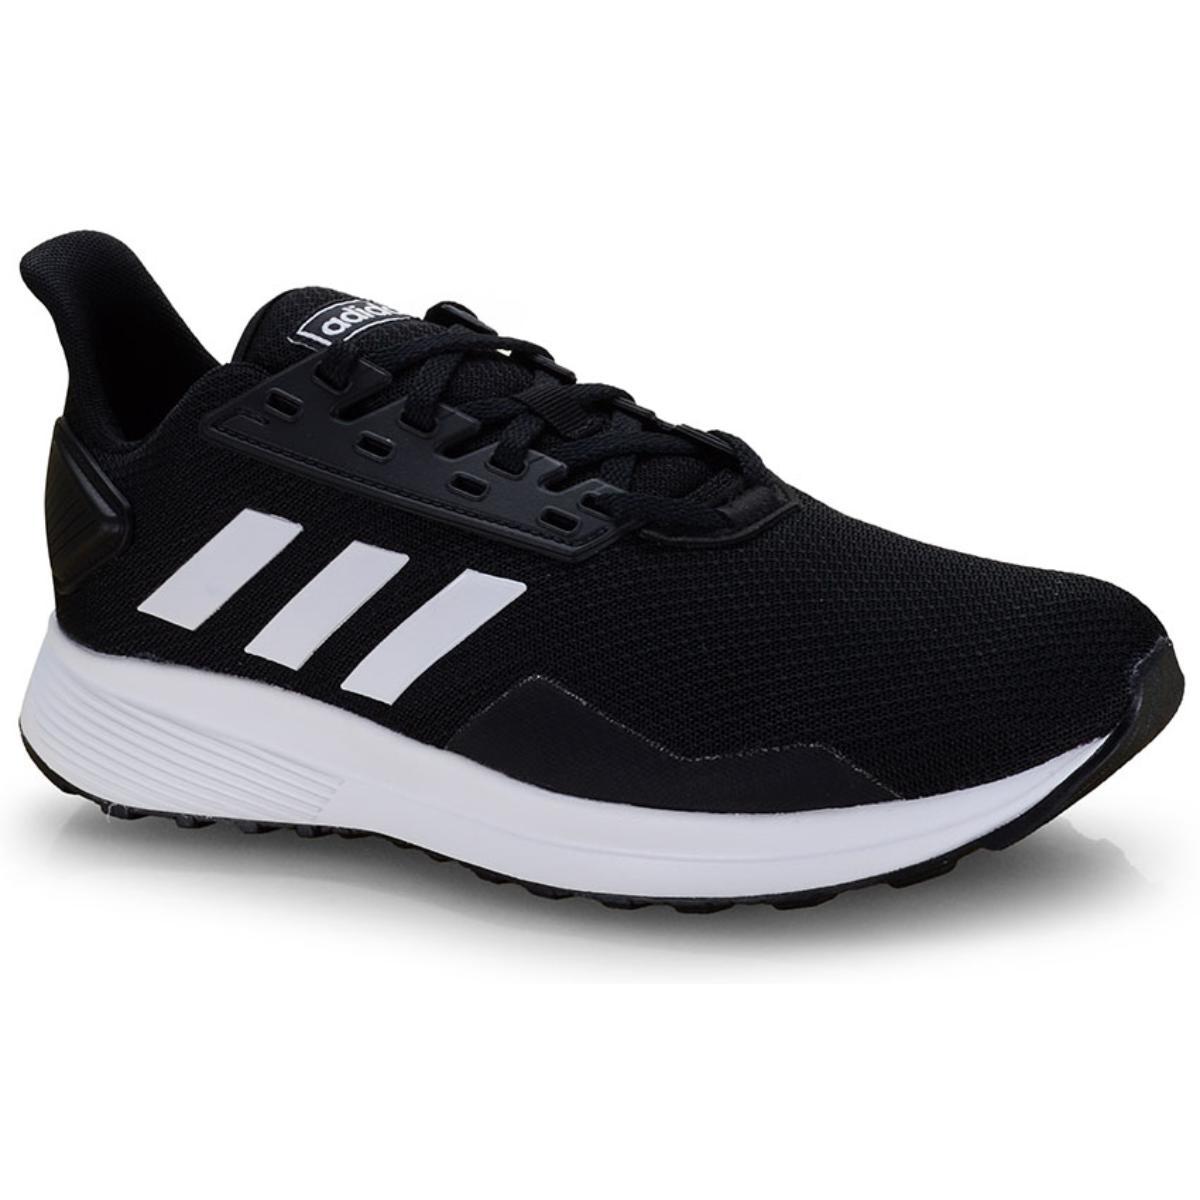 Tênis Masculino Adidas Bb7066 Duramo 9 Preto/branco